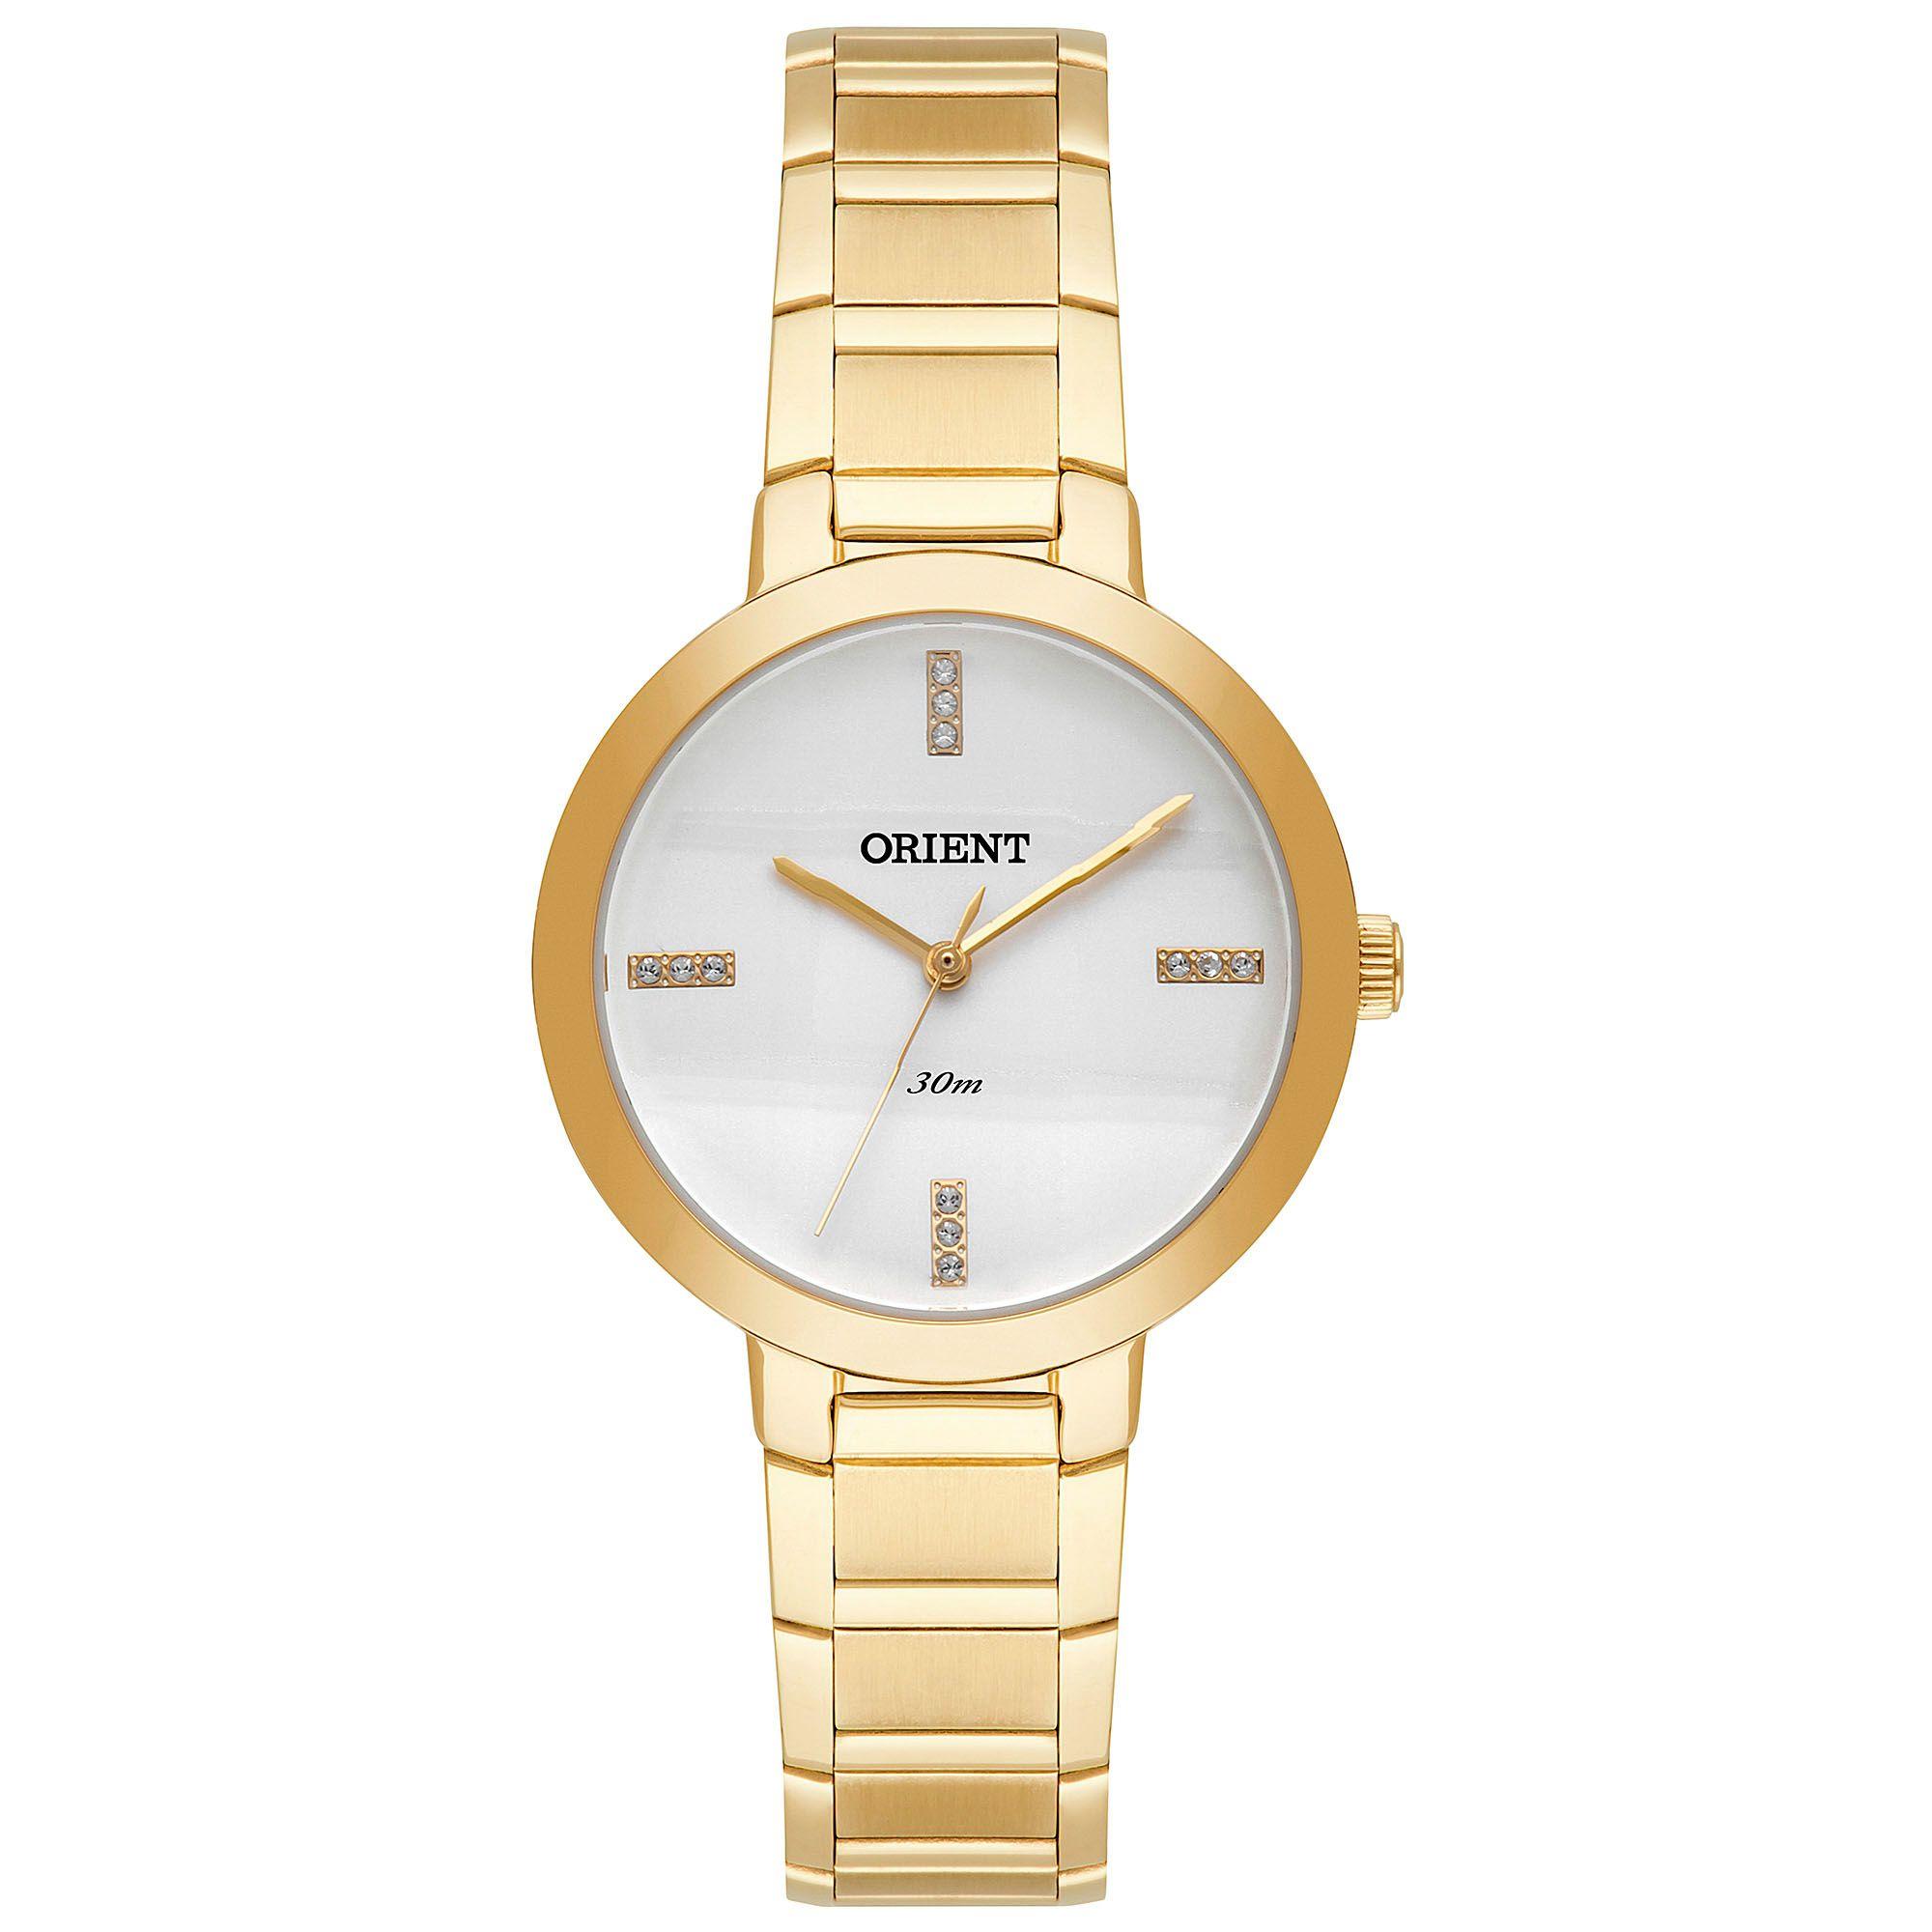 Relógio Feminino Orient FGSS0077 S1KX